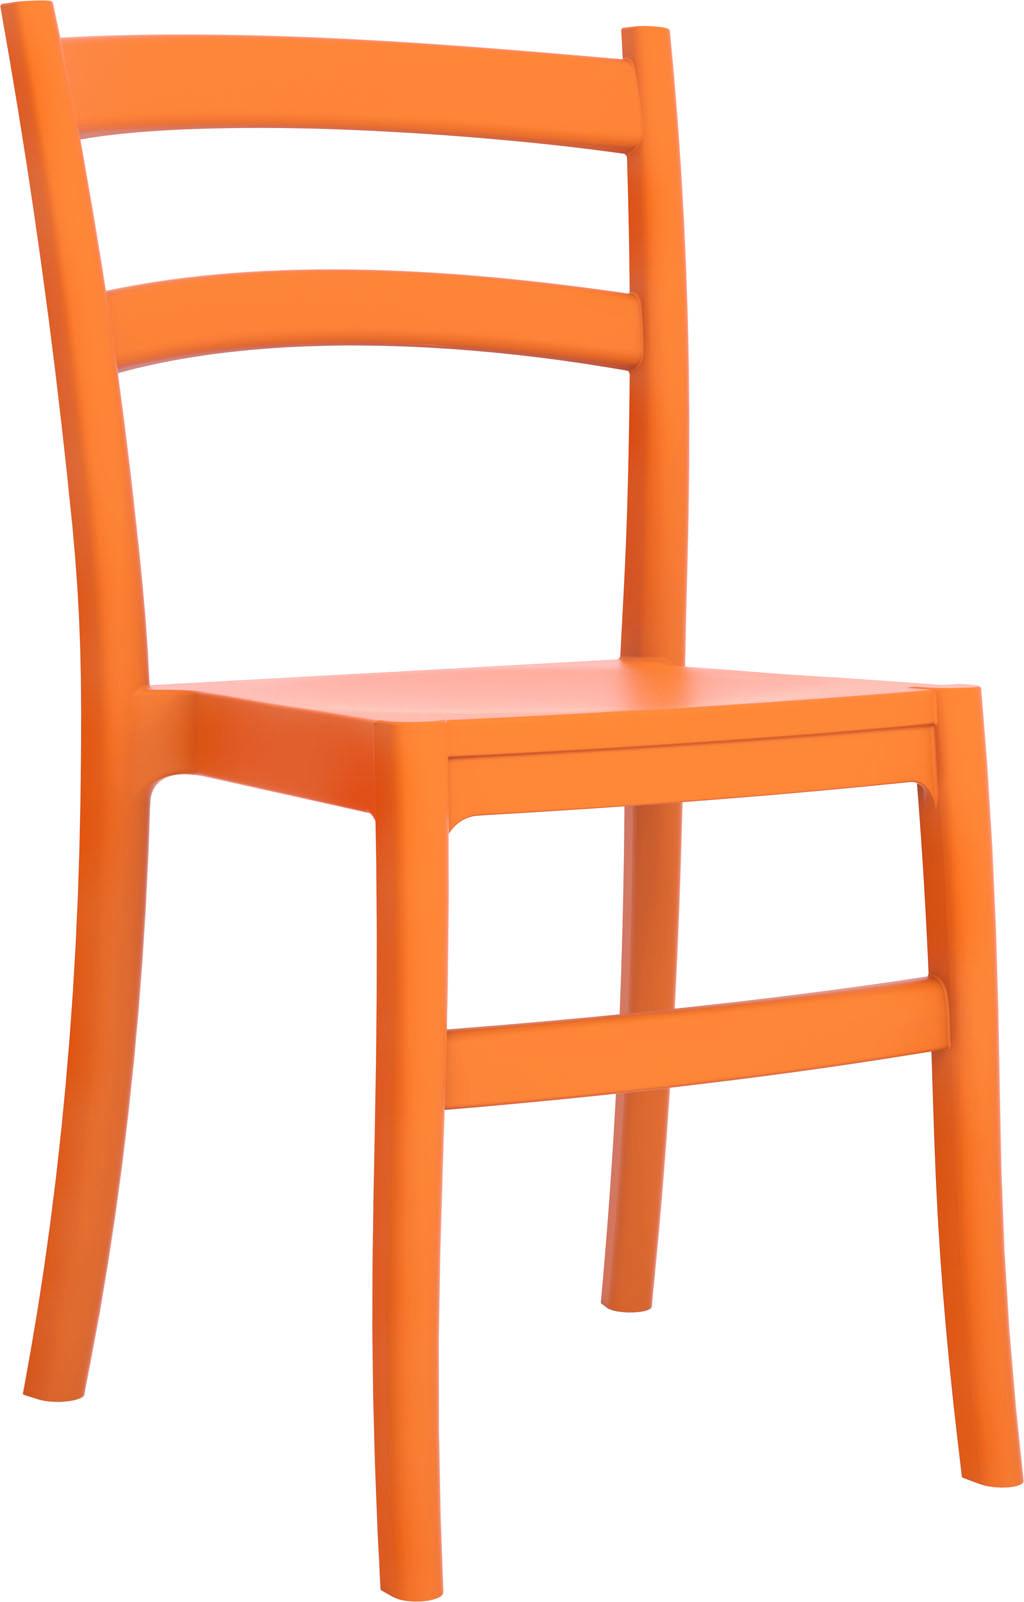 Tuin en terras kopen find here more than 40 items of for Bauhaus stoelen aanbieding